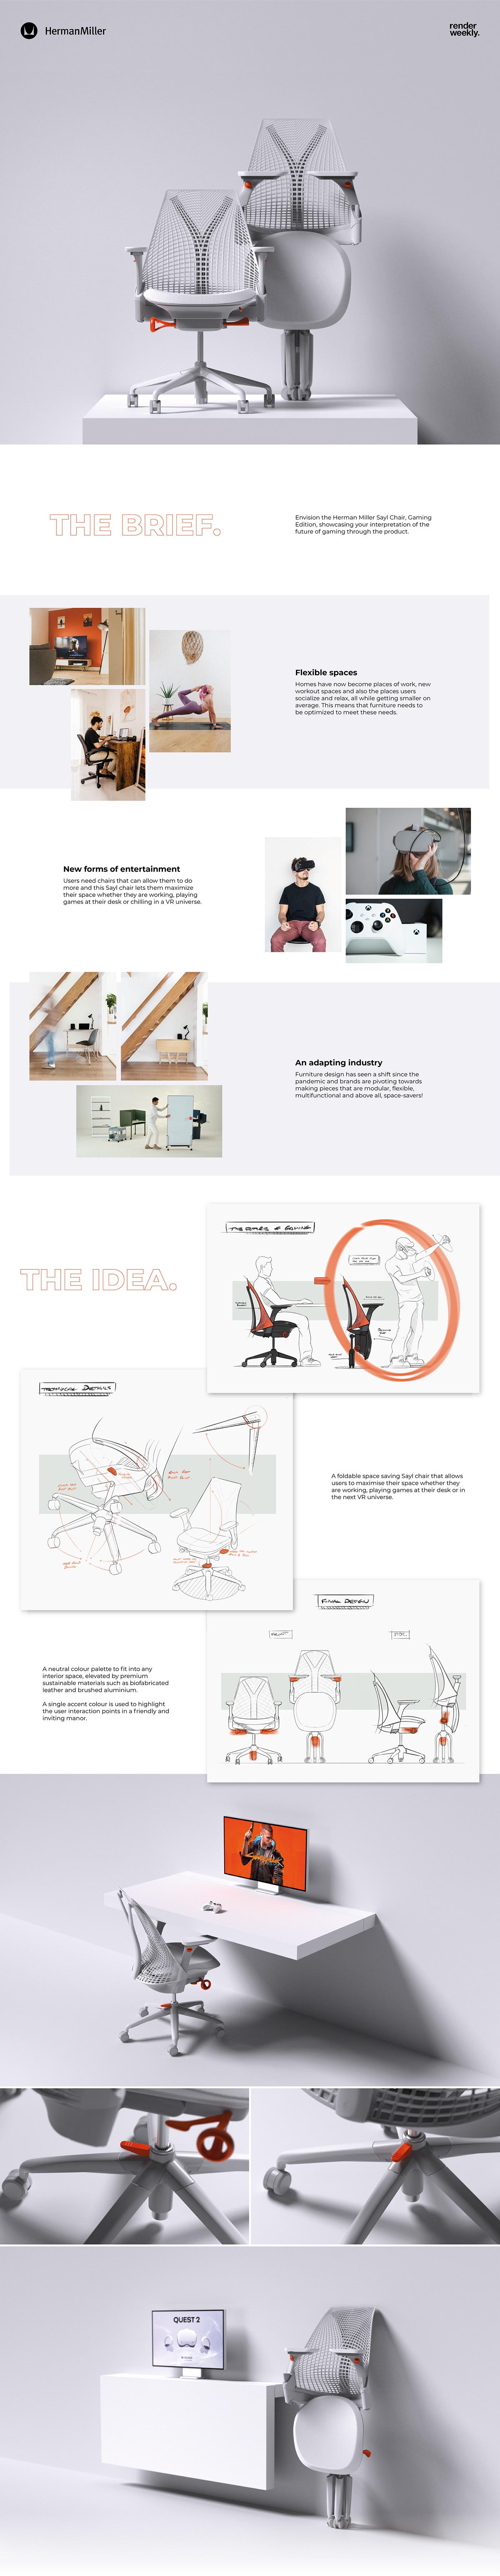 chair Entertainment Gaming Herman Miller industrial design  Interior Office Render sketching Virtual reality